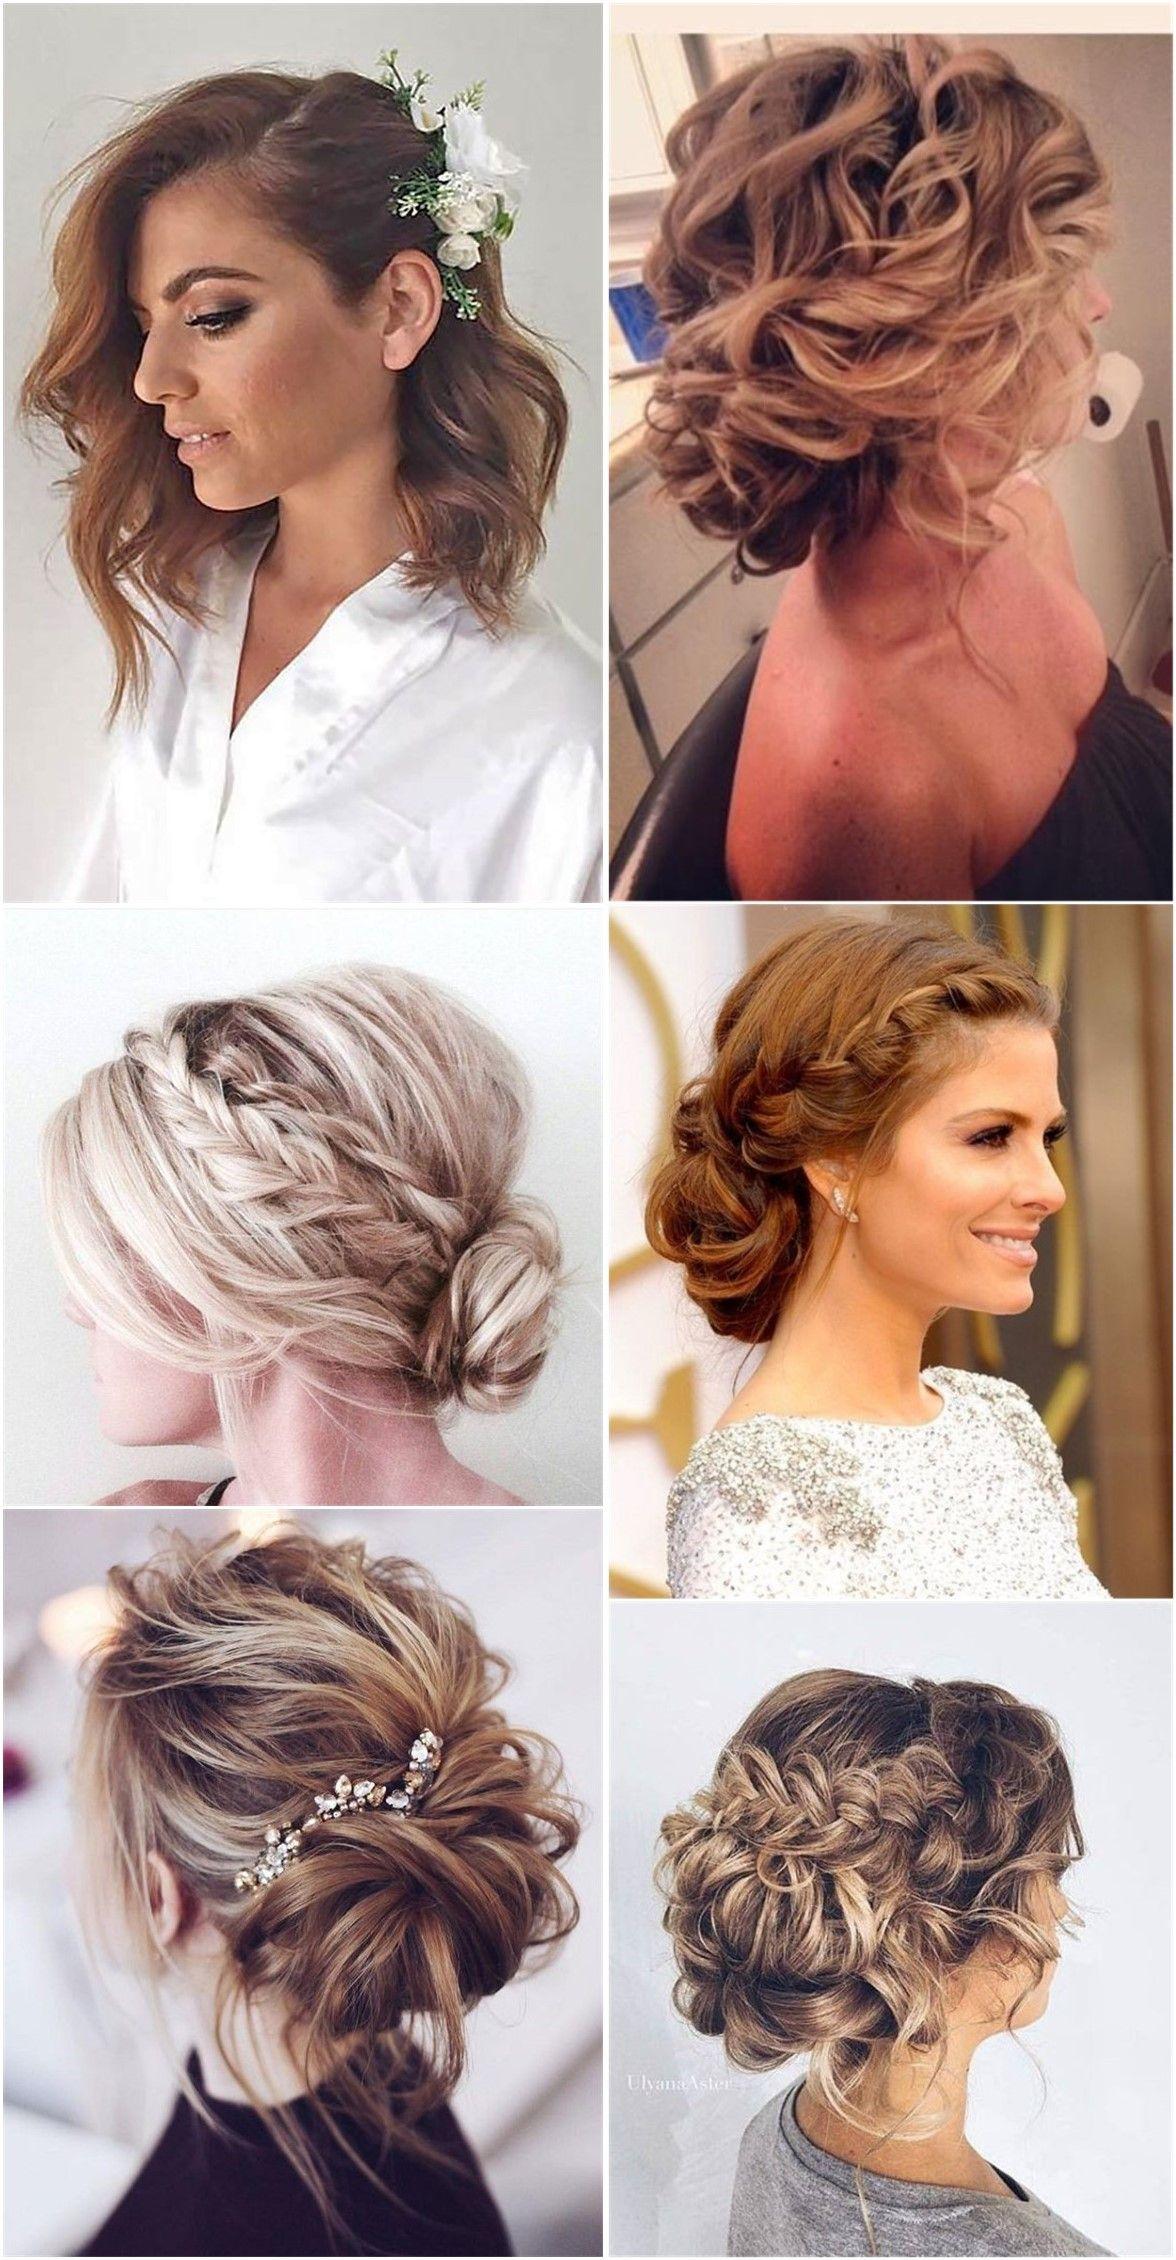 24 Lovely Medium length Hairstyles For 2018 Weddings